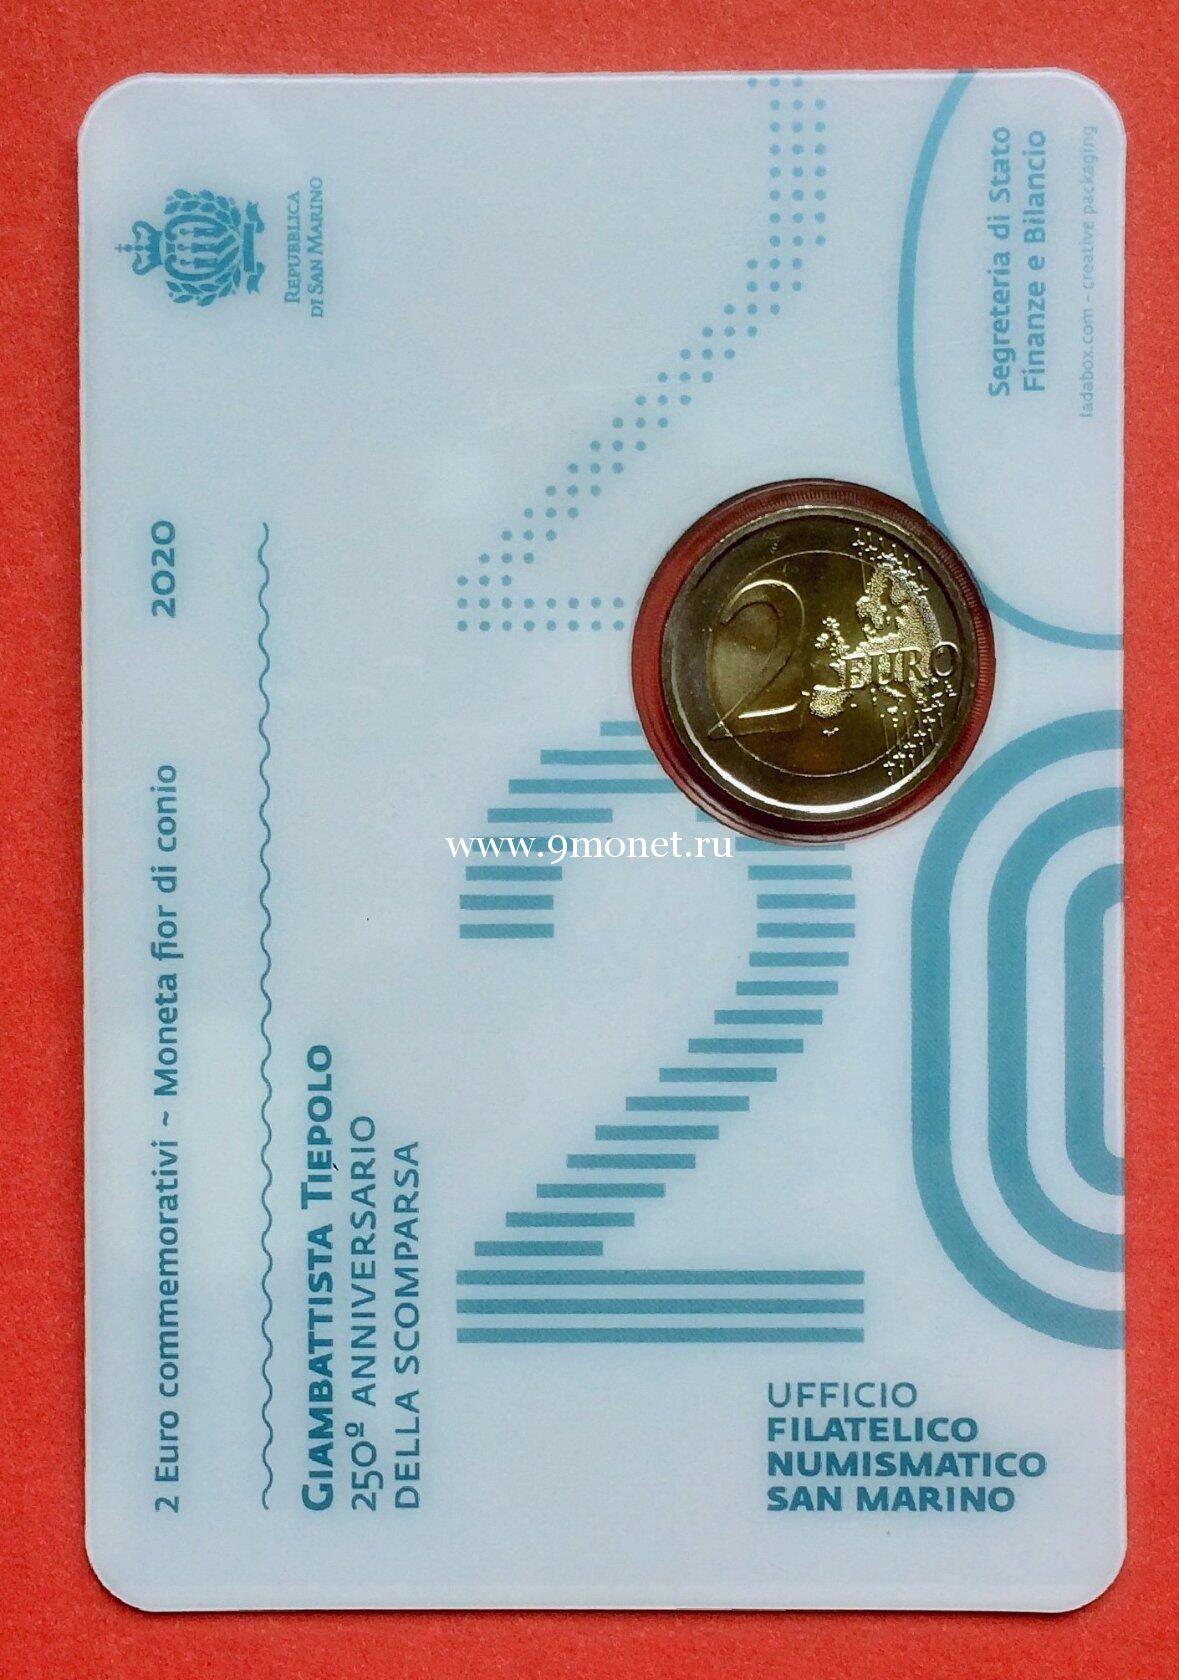 Сан-Марино 2 евро 2020 года Джованни Баттиста Тьеполо